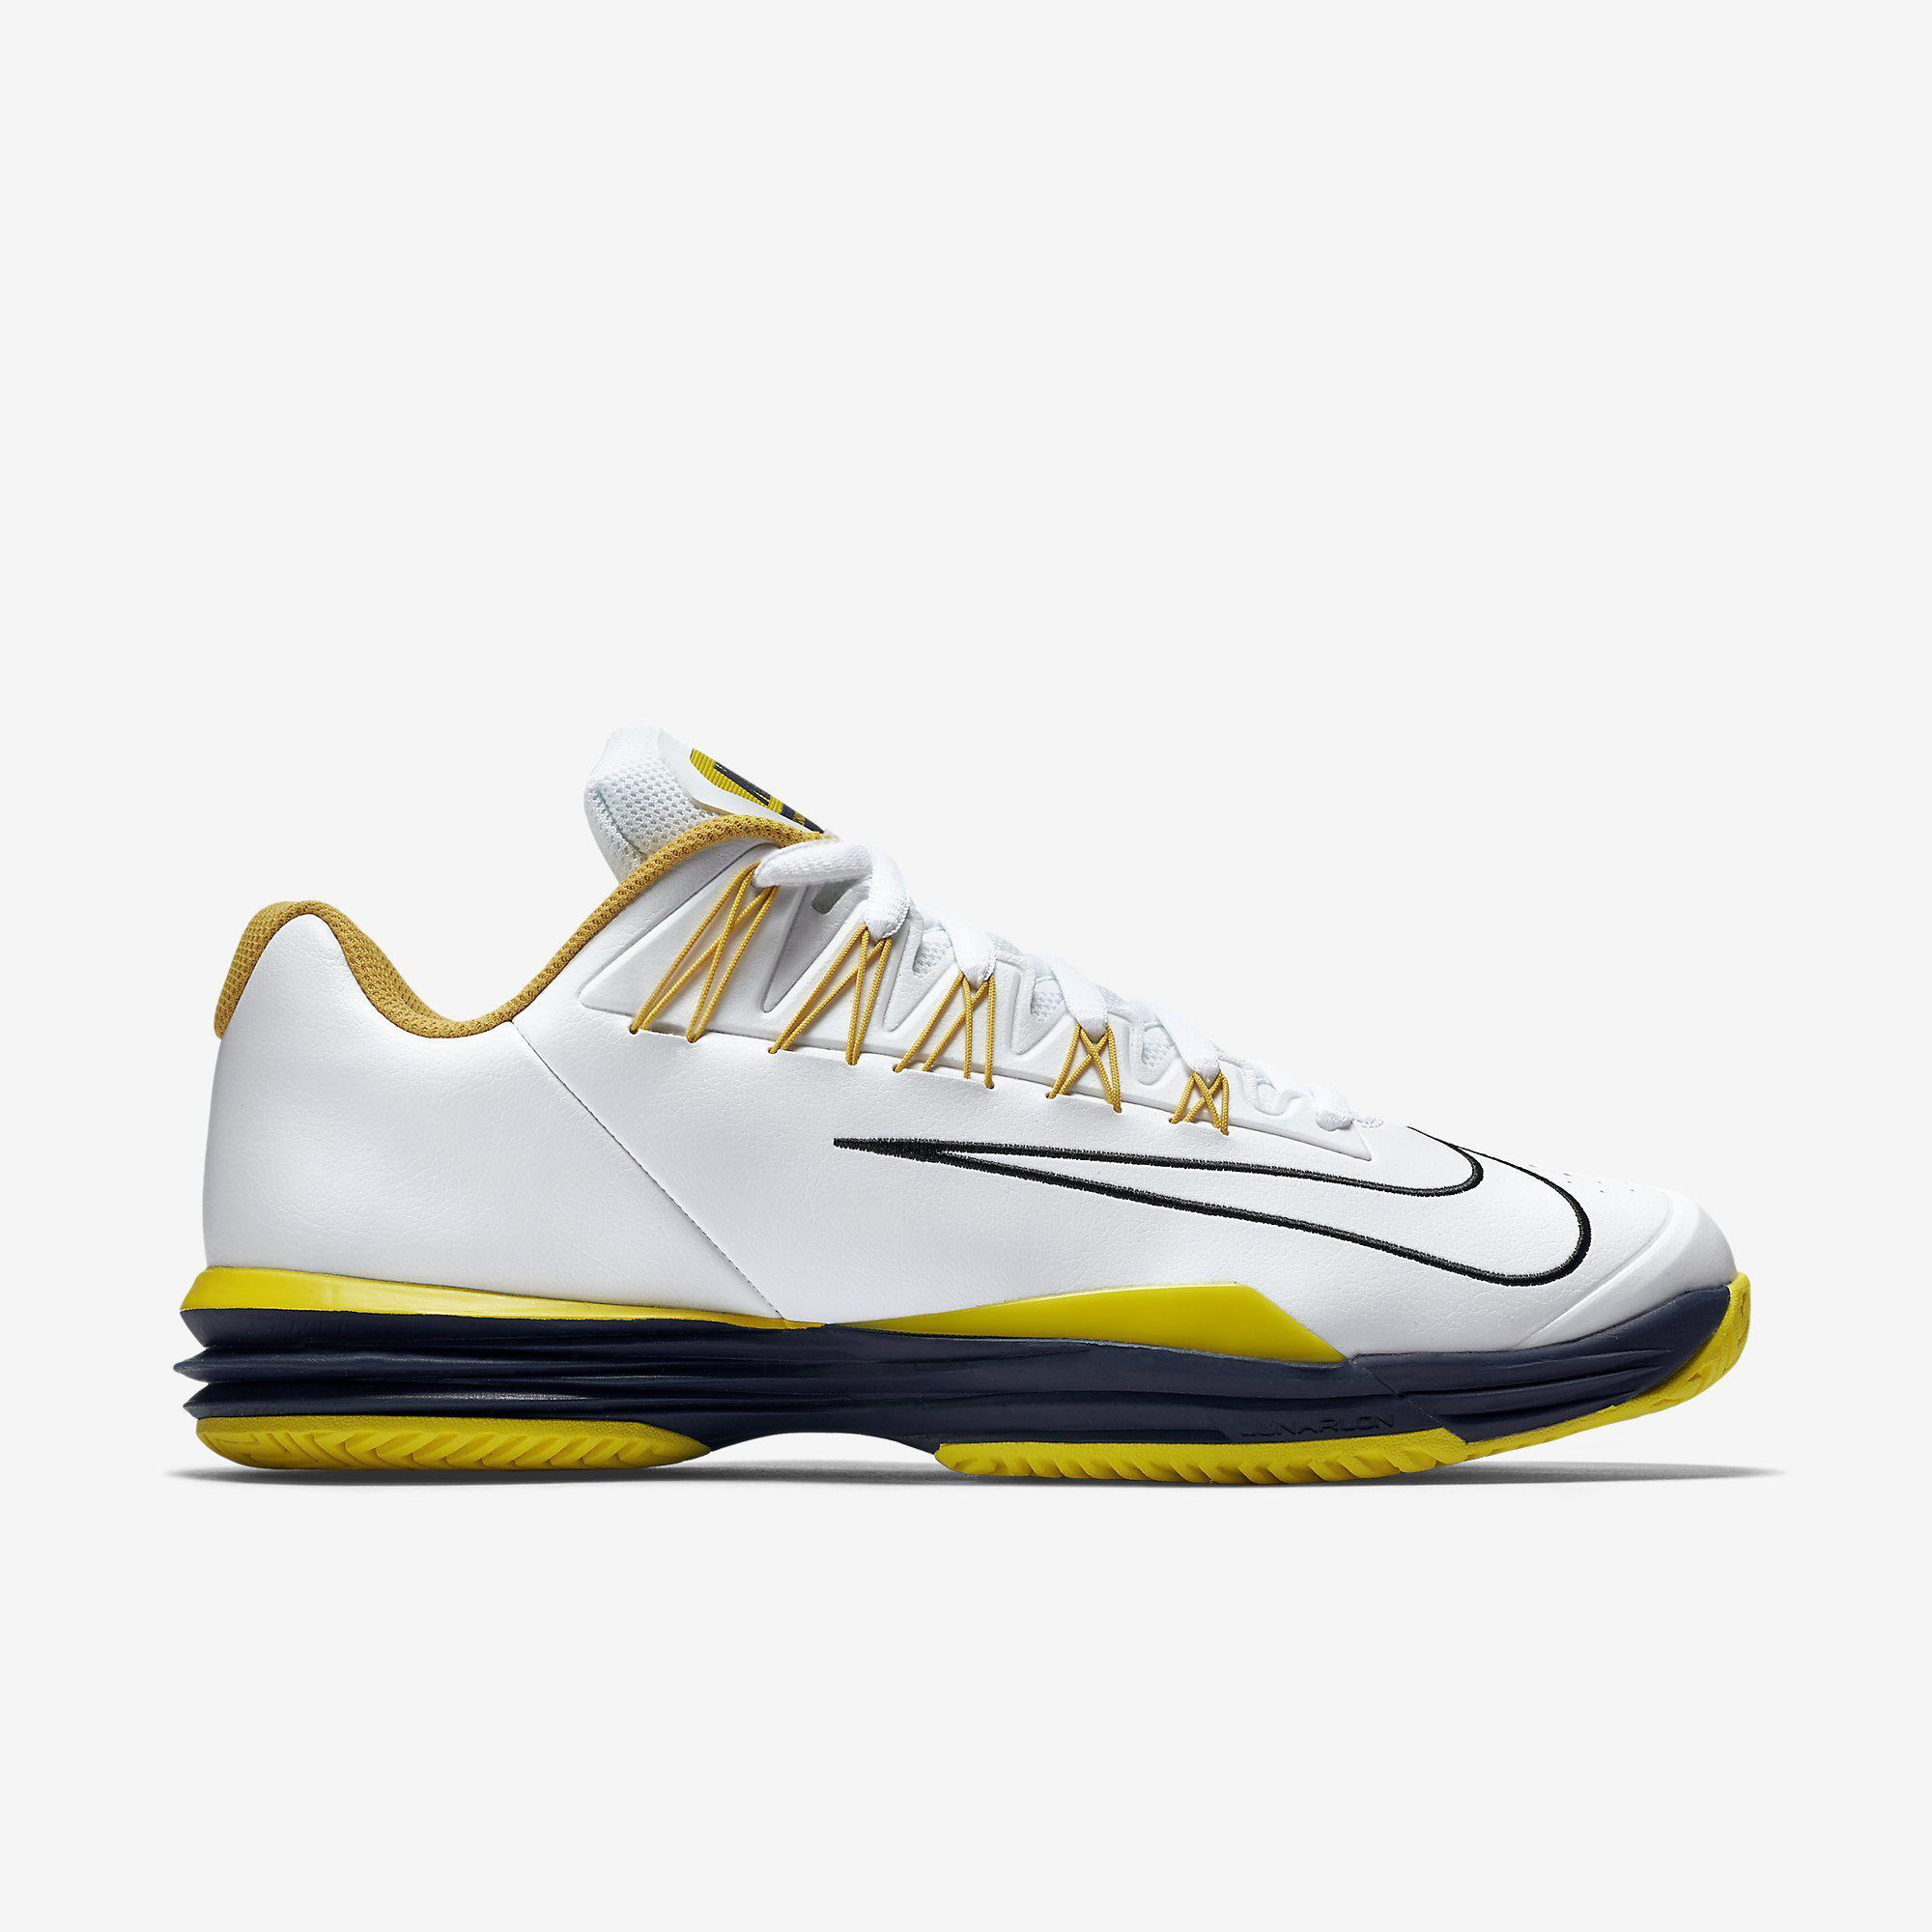 best service 2f5fb 80408 Nike Mens Lunar Ballistec 1.5 Tennis Shoes - White Optical Yellow -  Tennisnuts.com